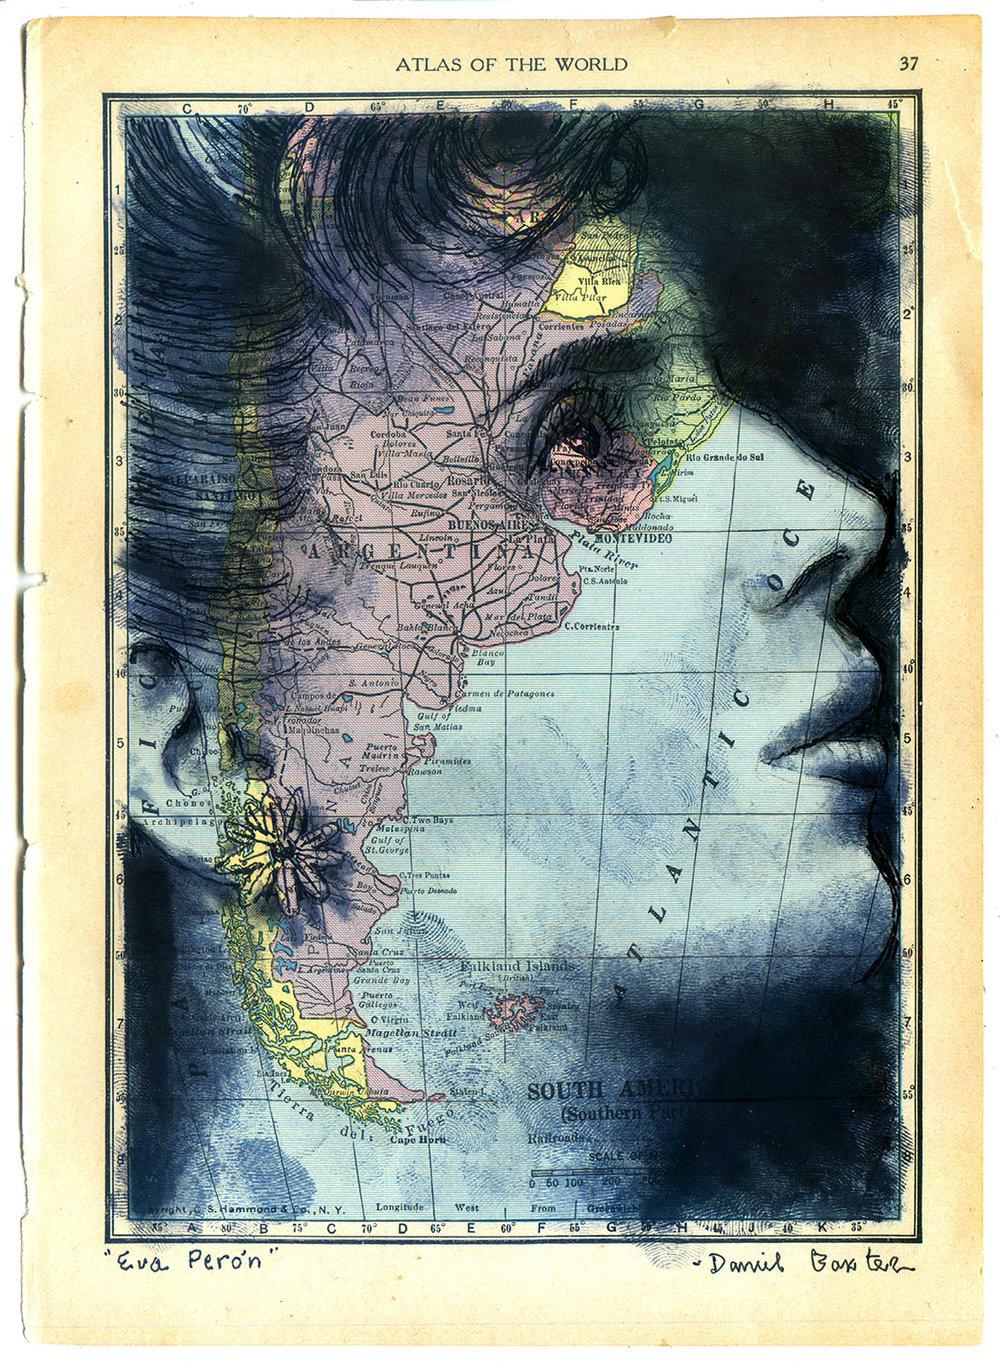 Daniel Baxter Evita Peron portrait.jpg